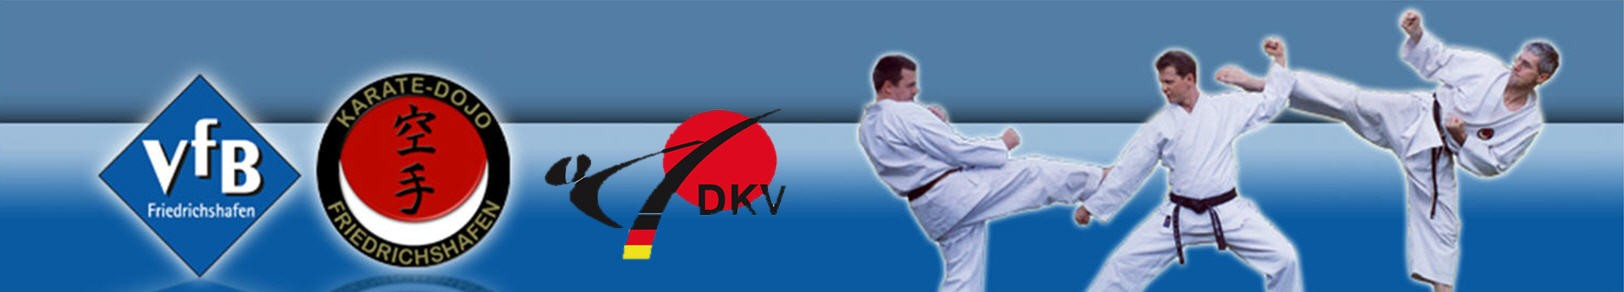 Karate Dojo Friedrichshafen